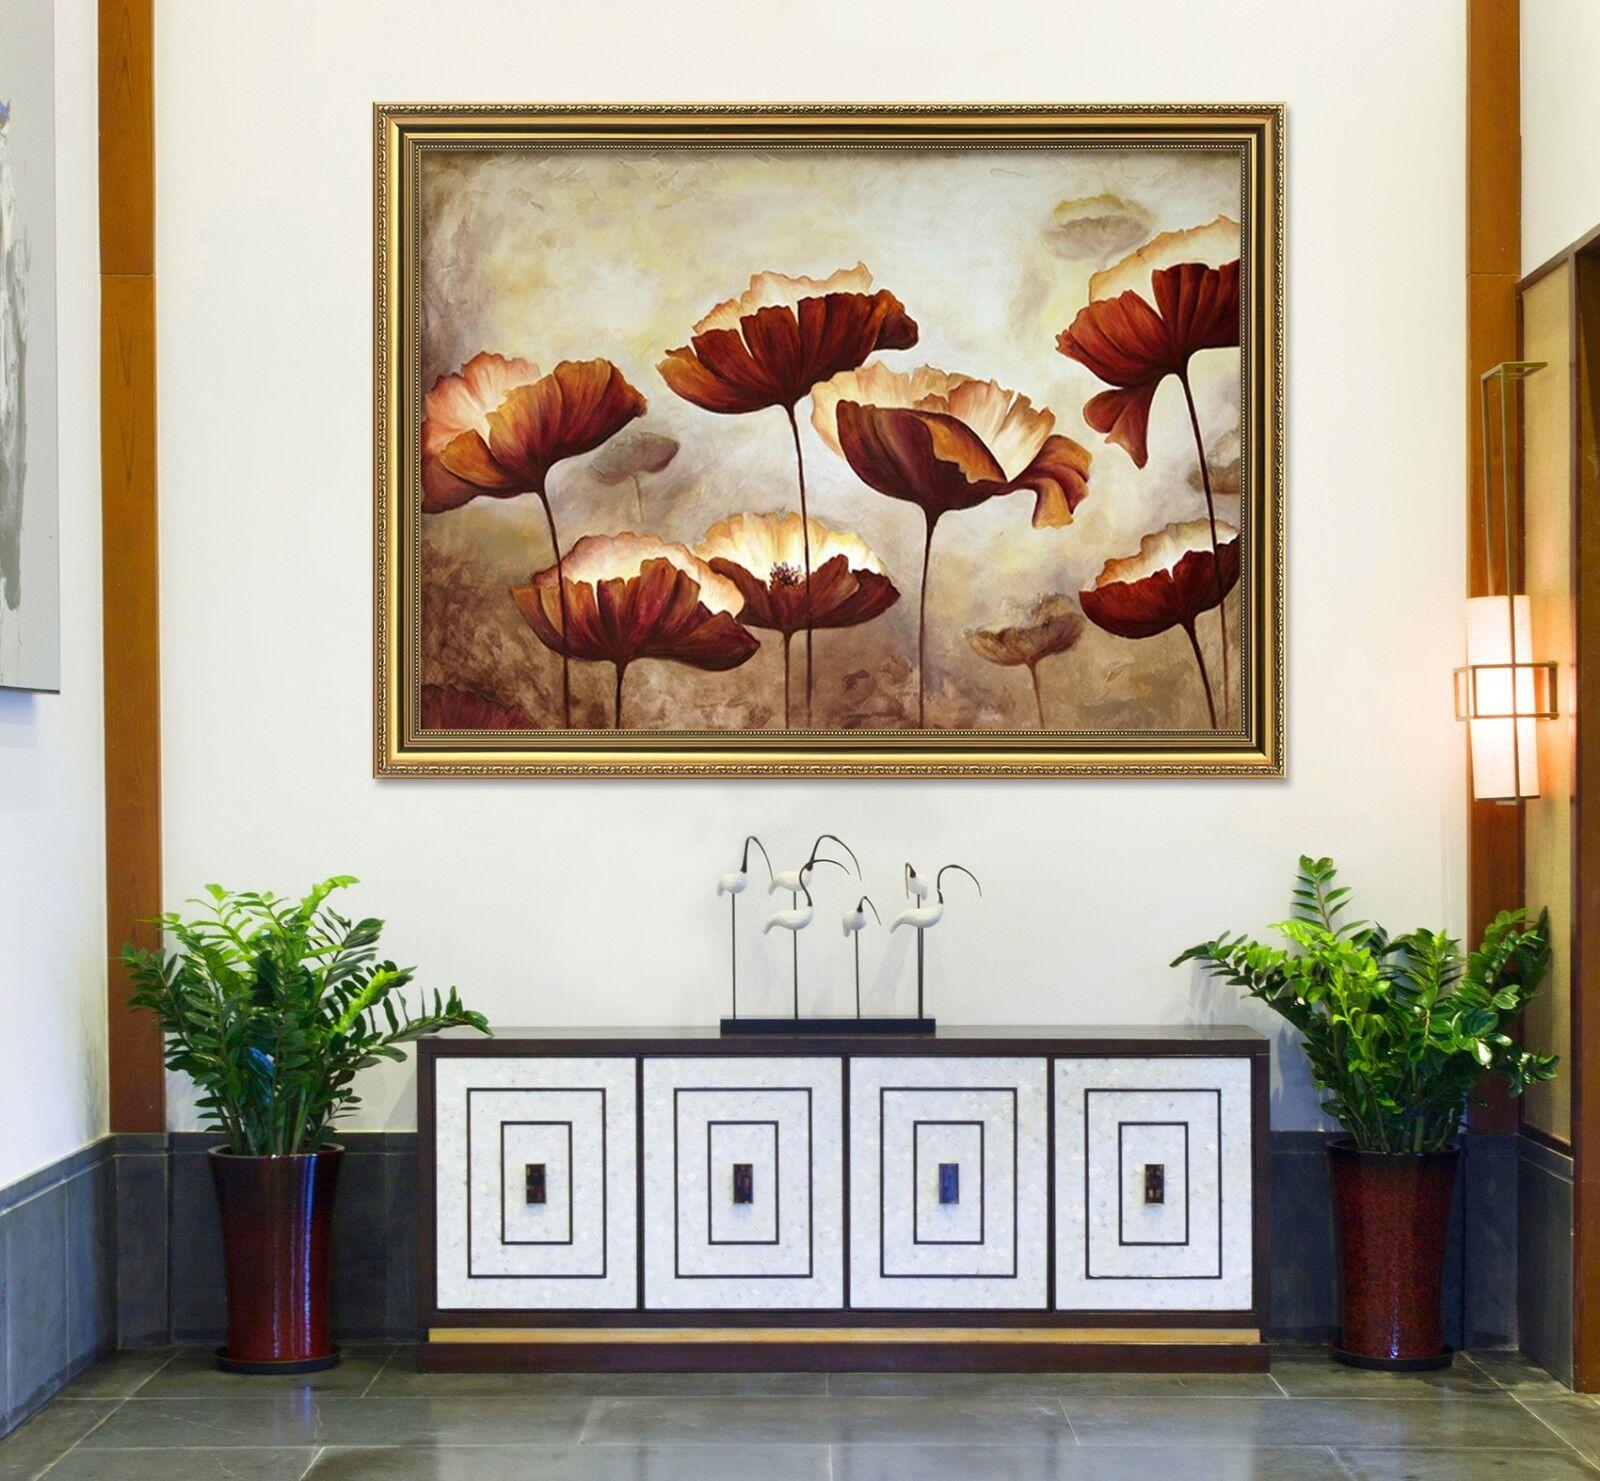 3D Póster Enmarcado 2 hoja de loto nostálgico Decoración del Hogar Pintura de impresión AJ Wallpaper